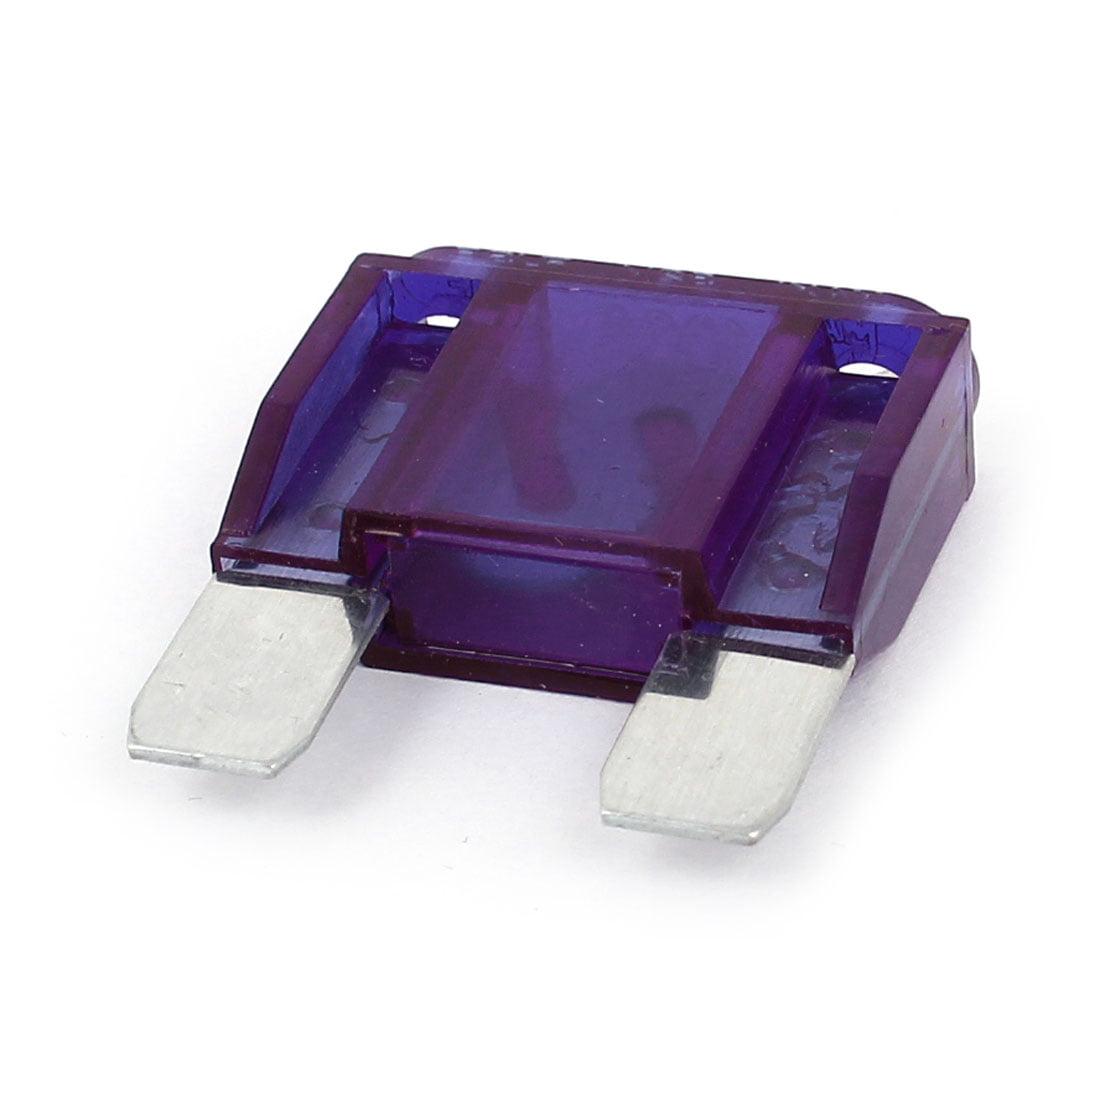 Unique Bargains Purple Plastic Casing 100A 32V Standard ATC/ATO Blade Fuse for Auto Car Truck